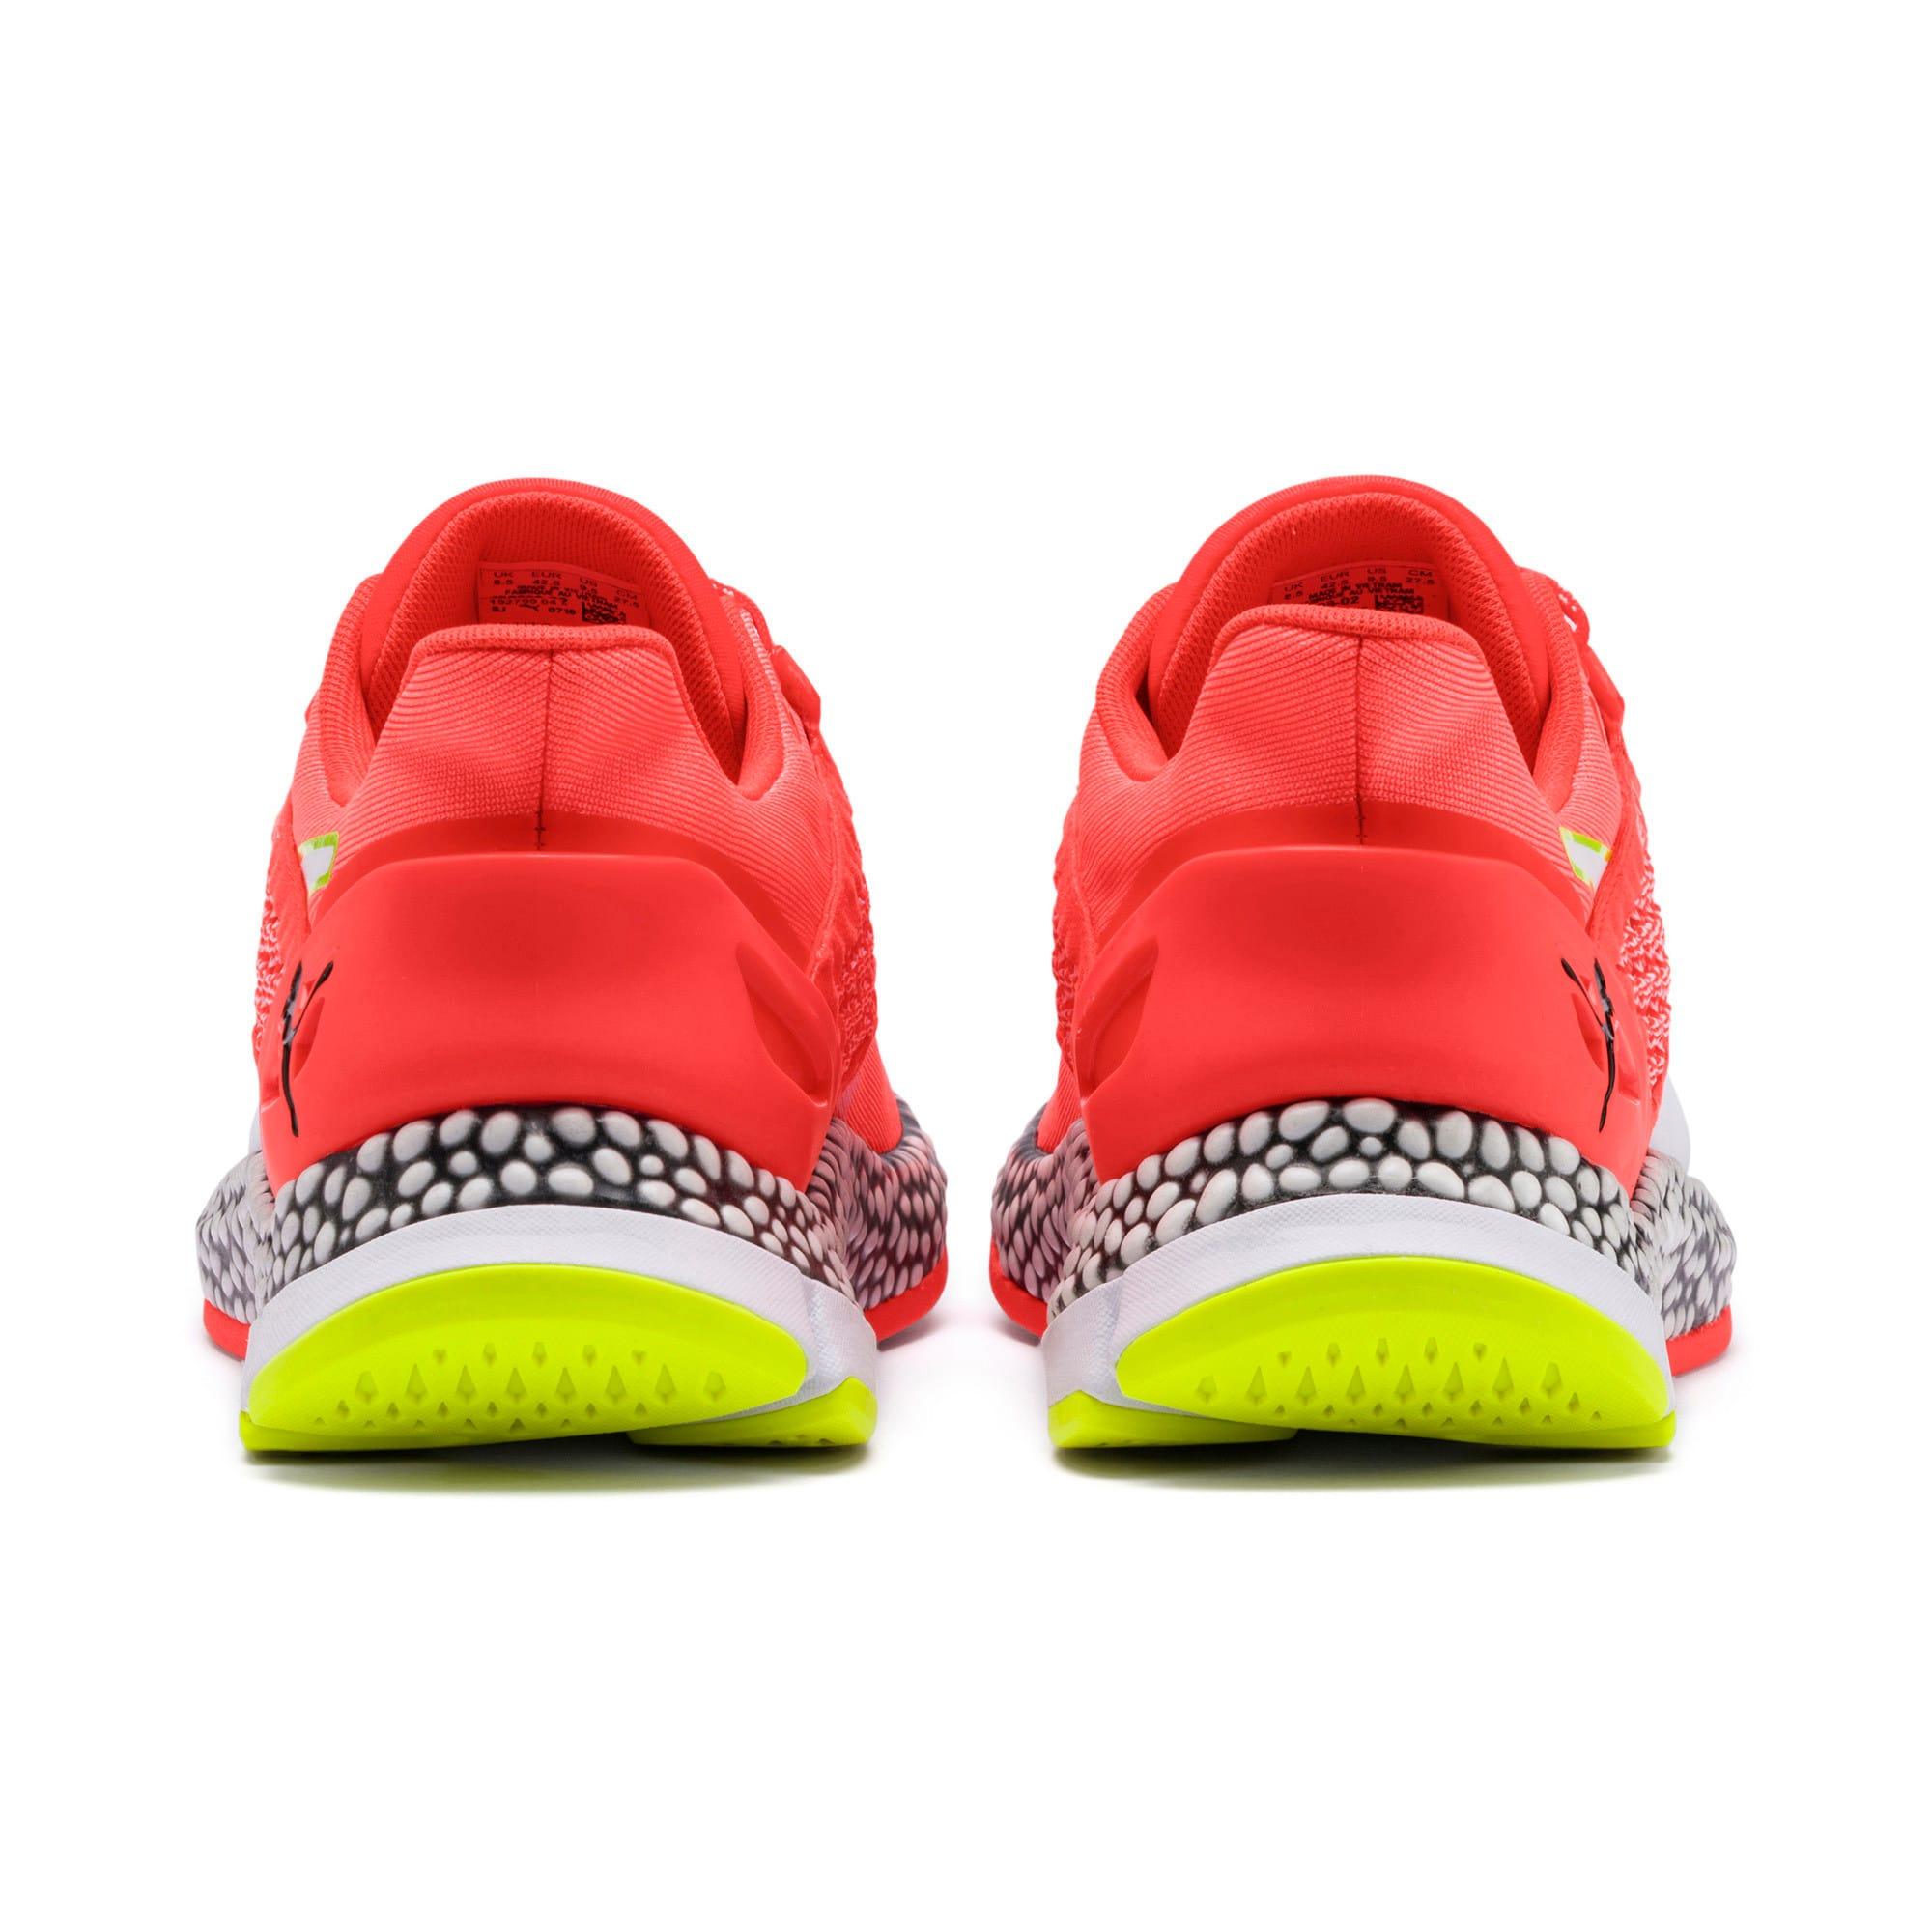 Thumbnail 4 of HYBRID Astro Men's Running Shoes, Nrgy Red-Puma Black, medium